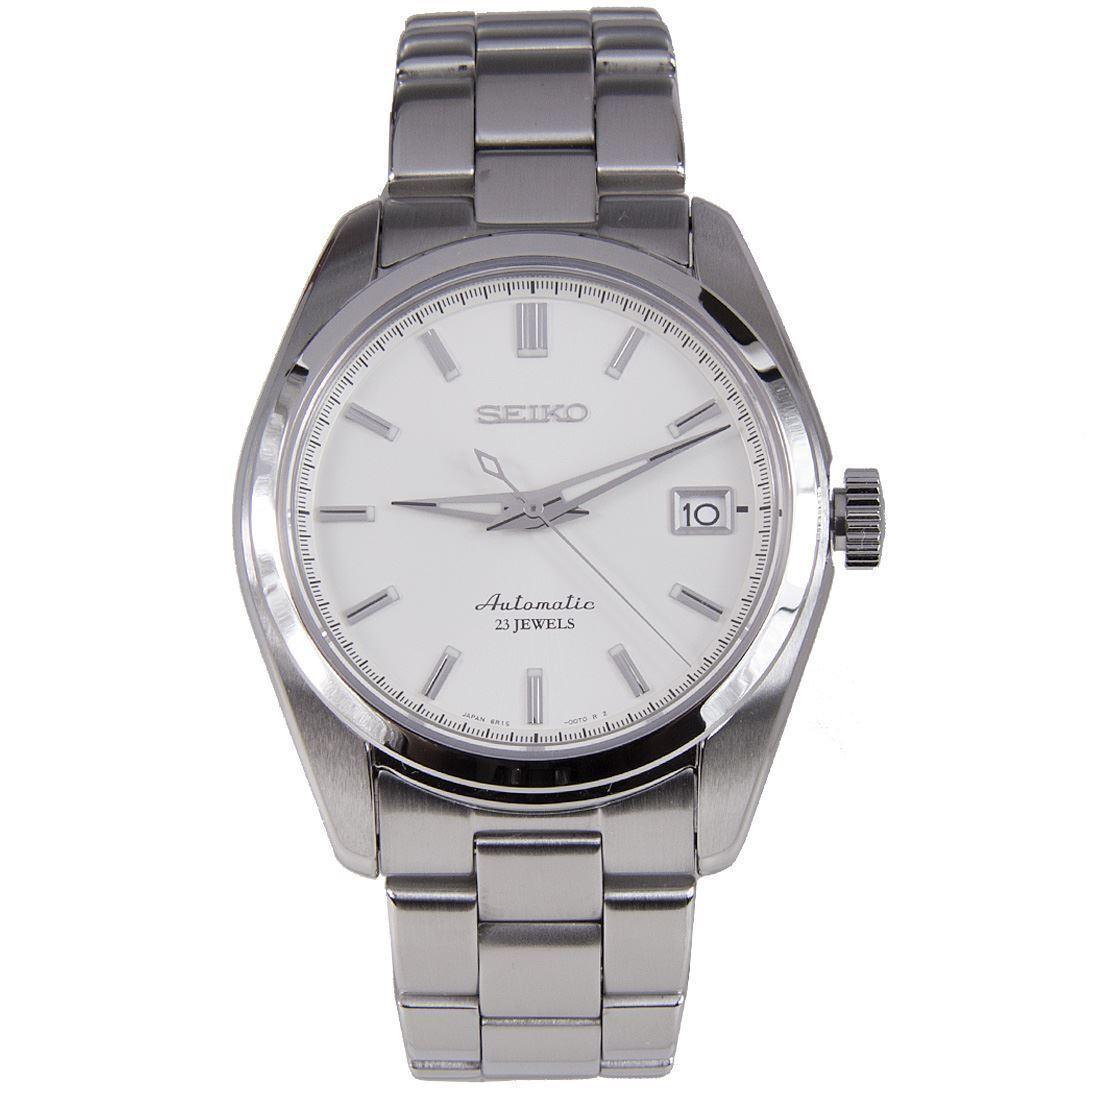 Seiko Mechanical Sarb035 Wrist Watch For Men Silver Beige